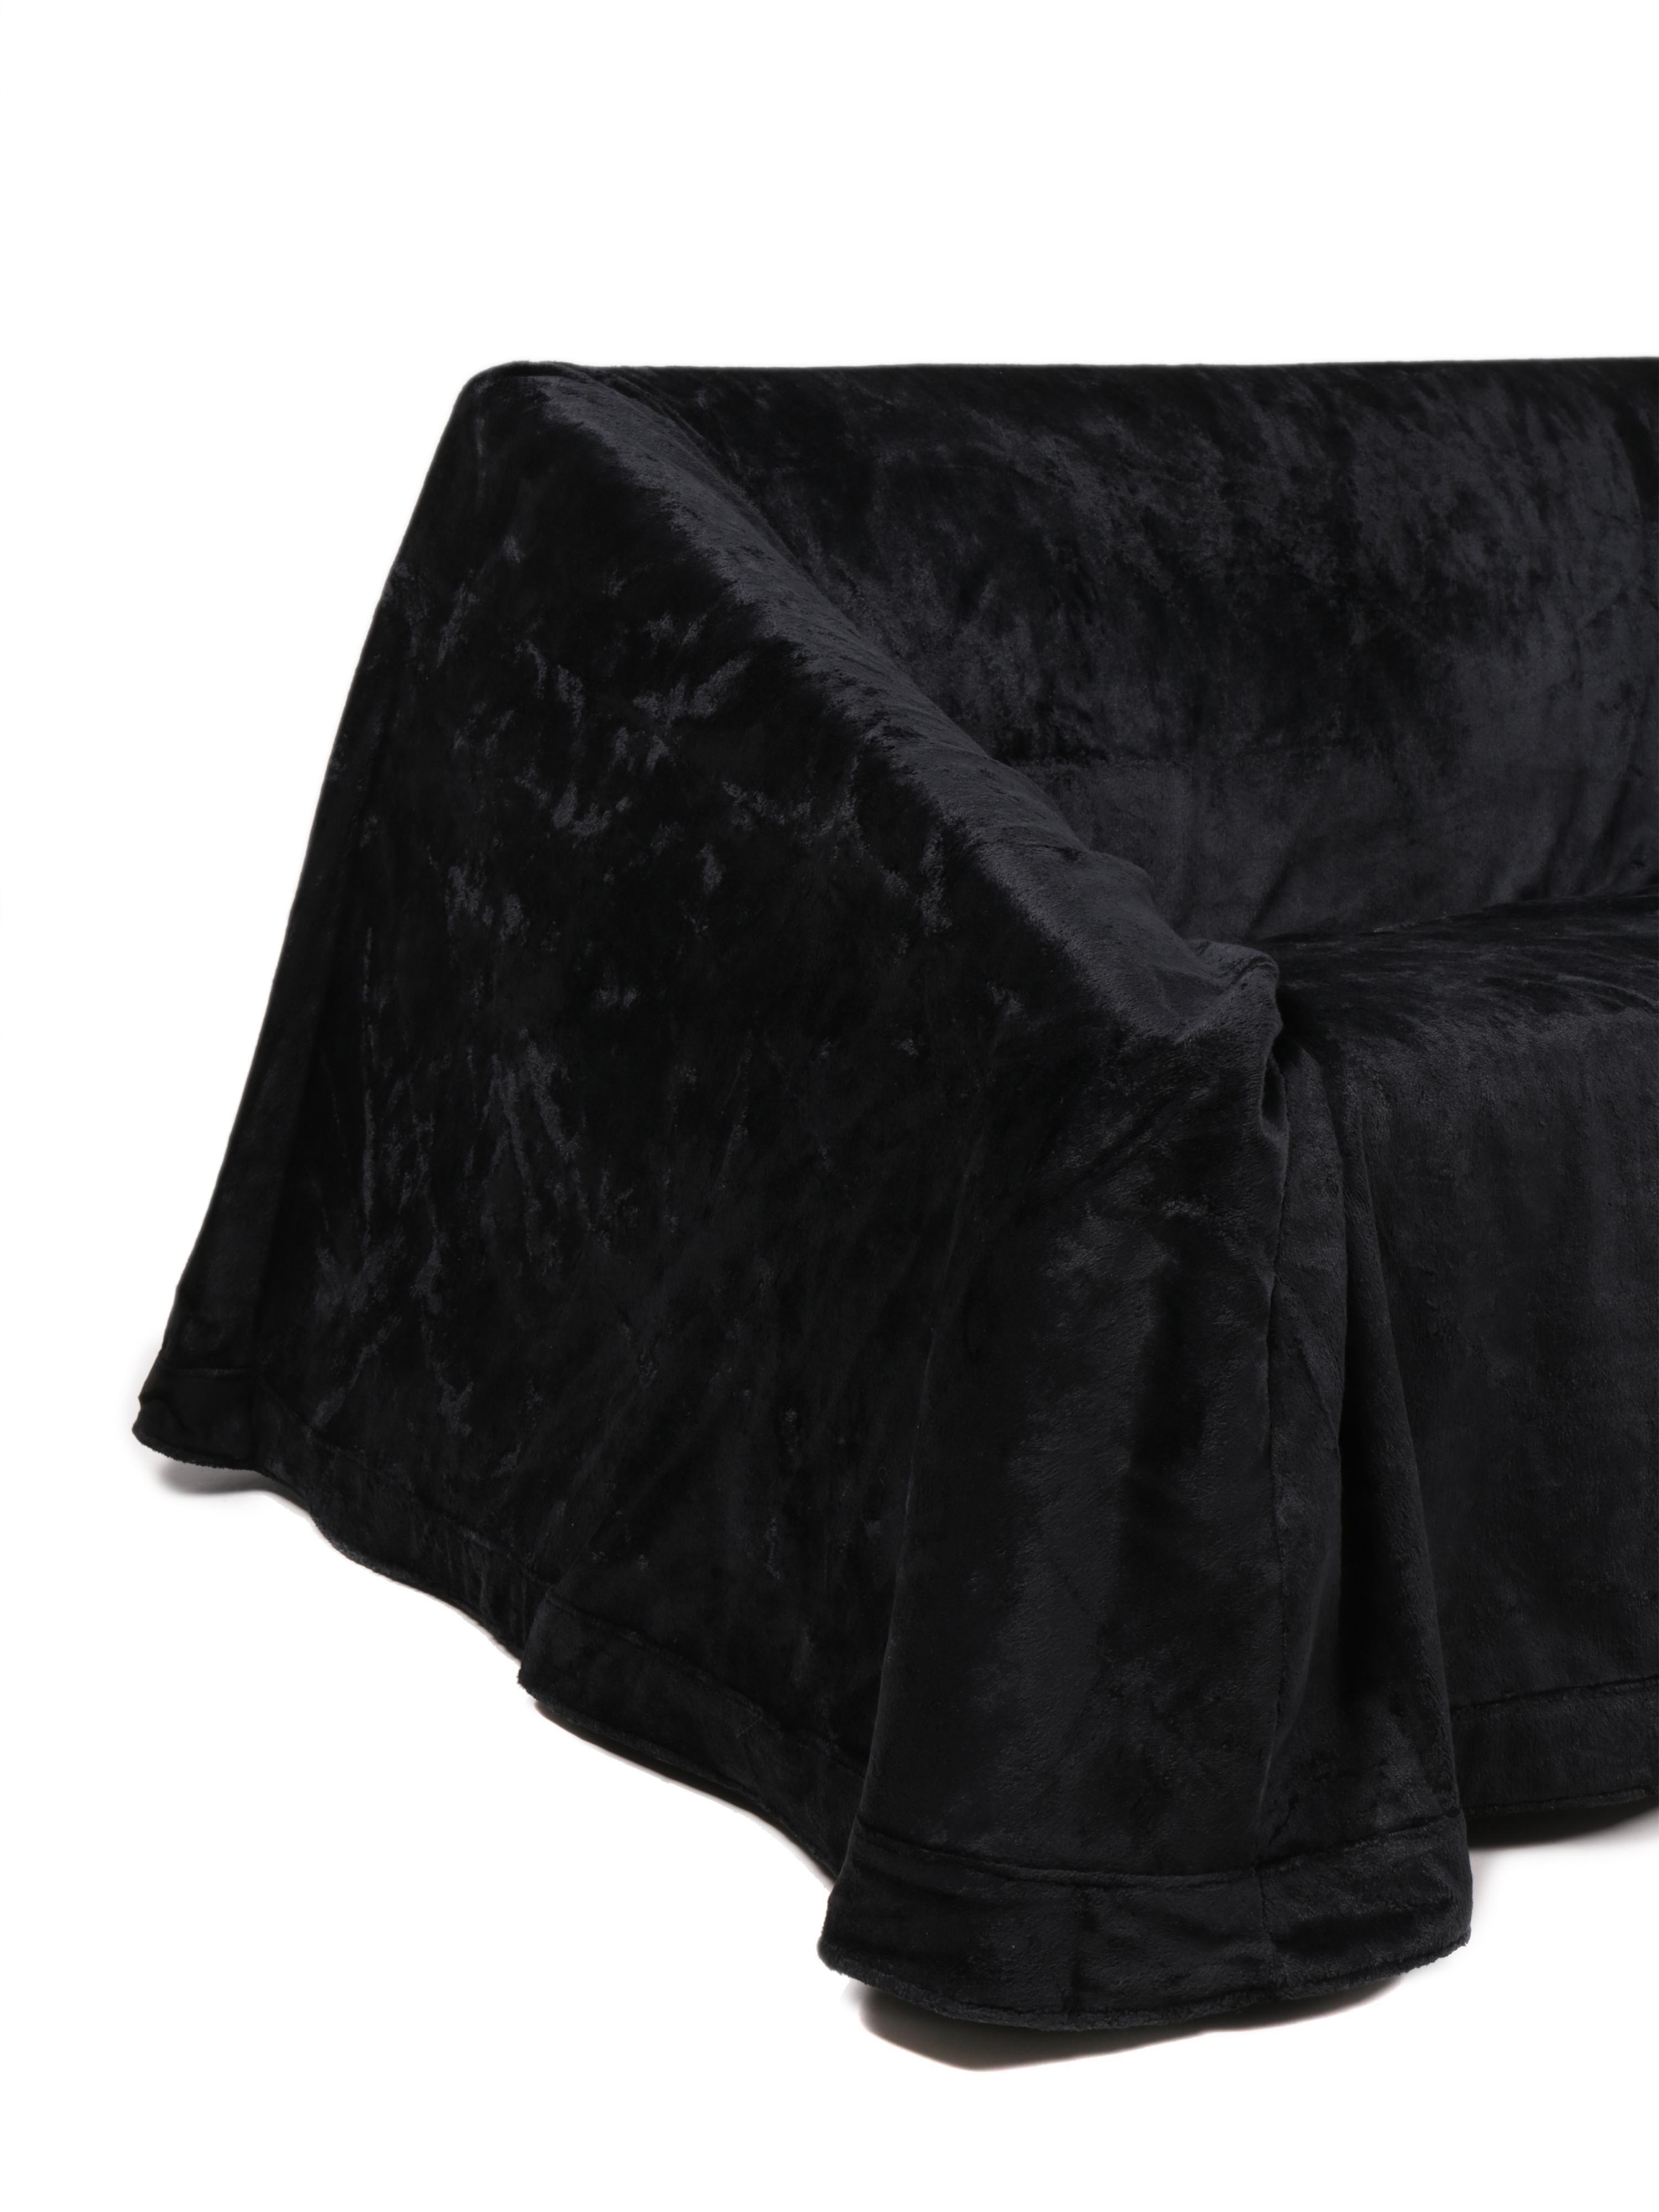 Modern ParadisoTerrestre Mantilla Sofa 160 In Black Velvet By Kazuhide  Takahama For Sale